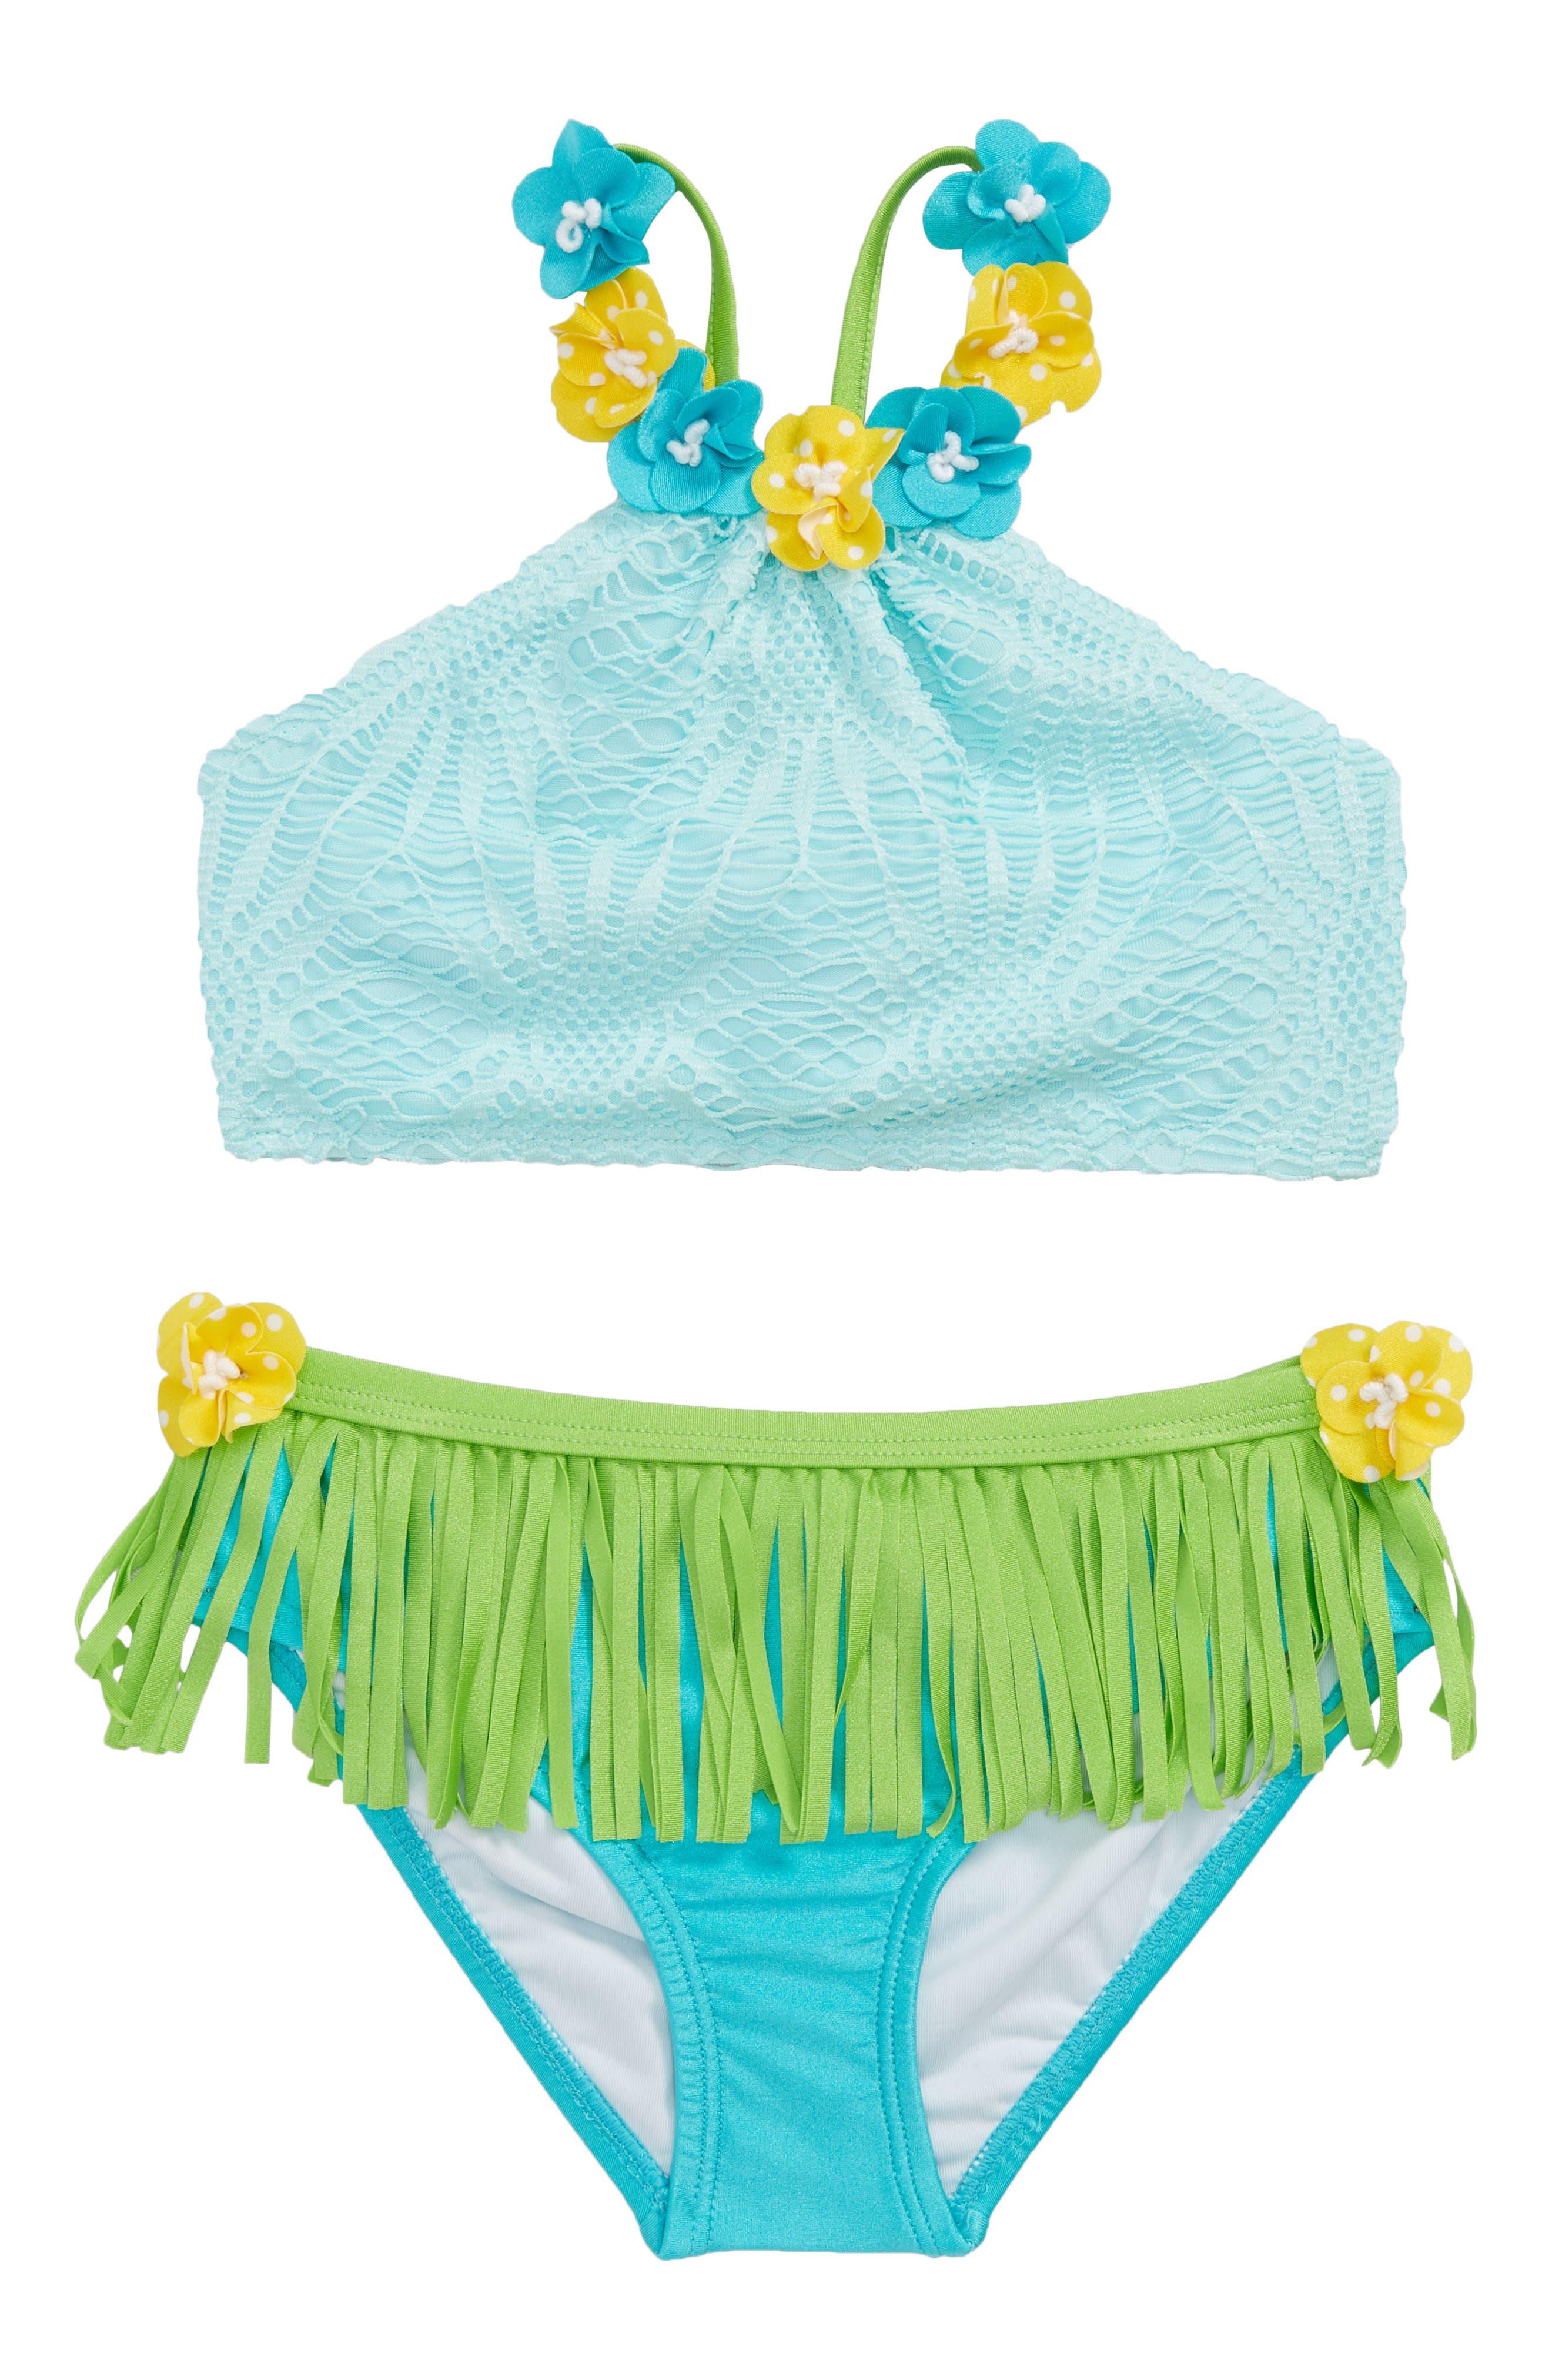 Hula Two-Piece Bikini Swimsuit,                             Main thumbnail 1, color,                             Aqua